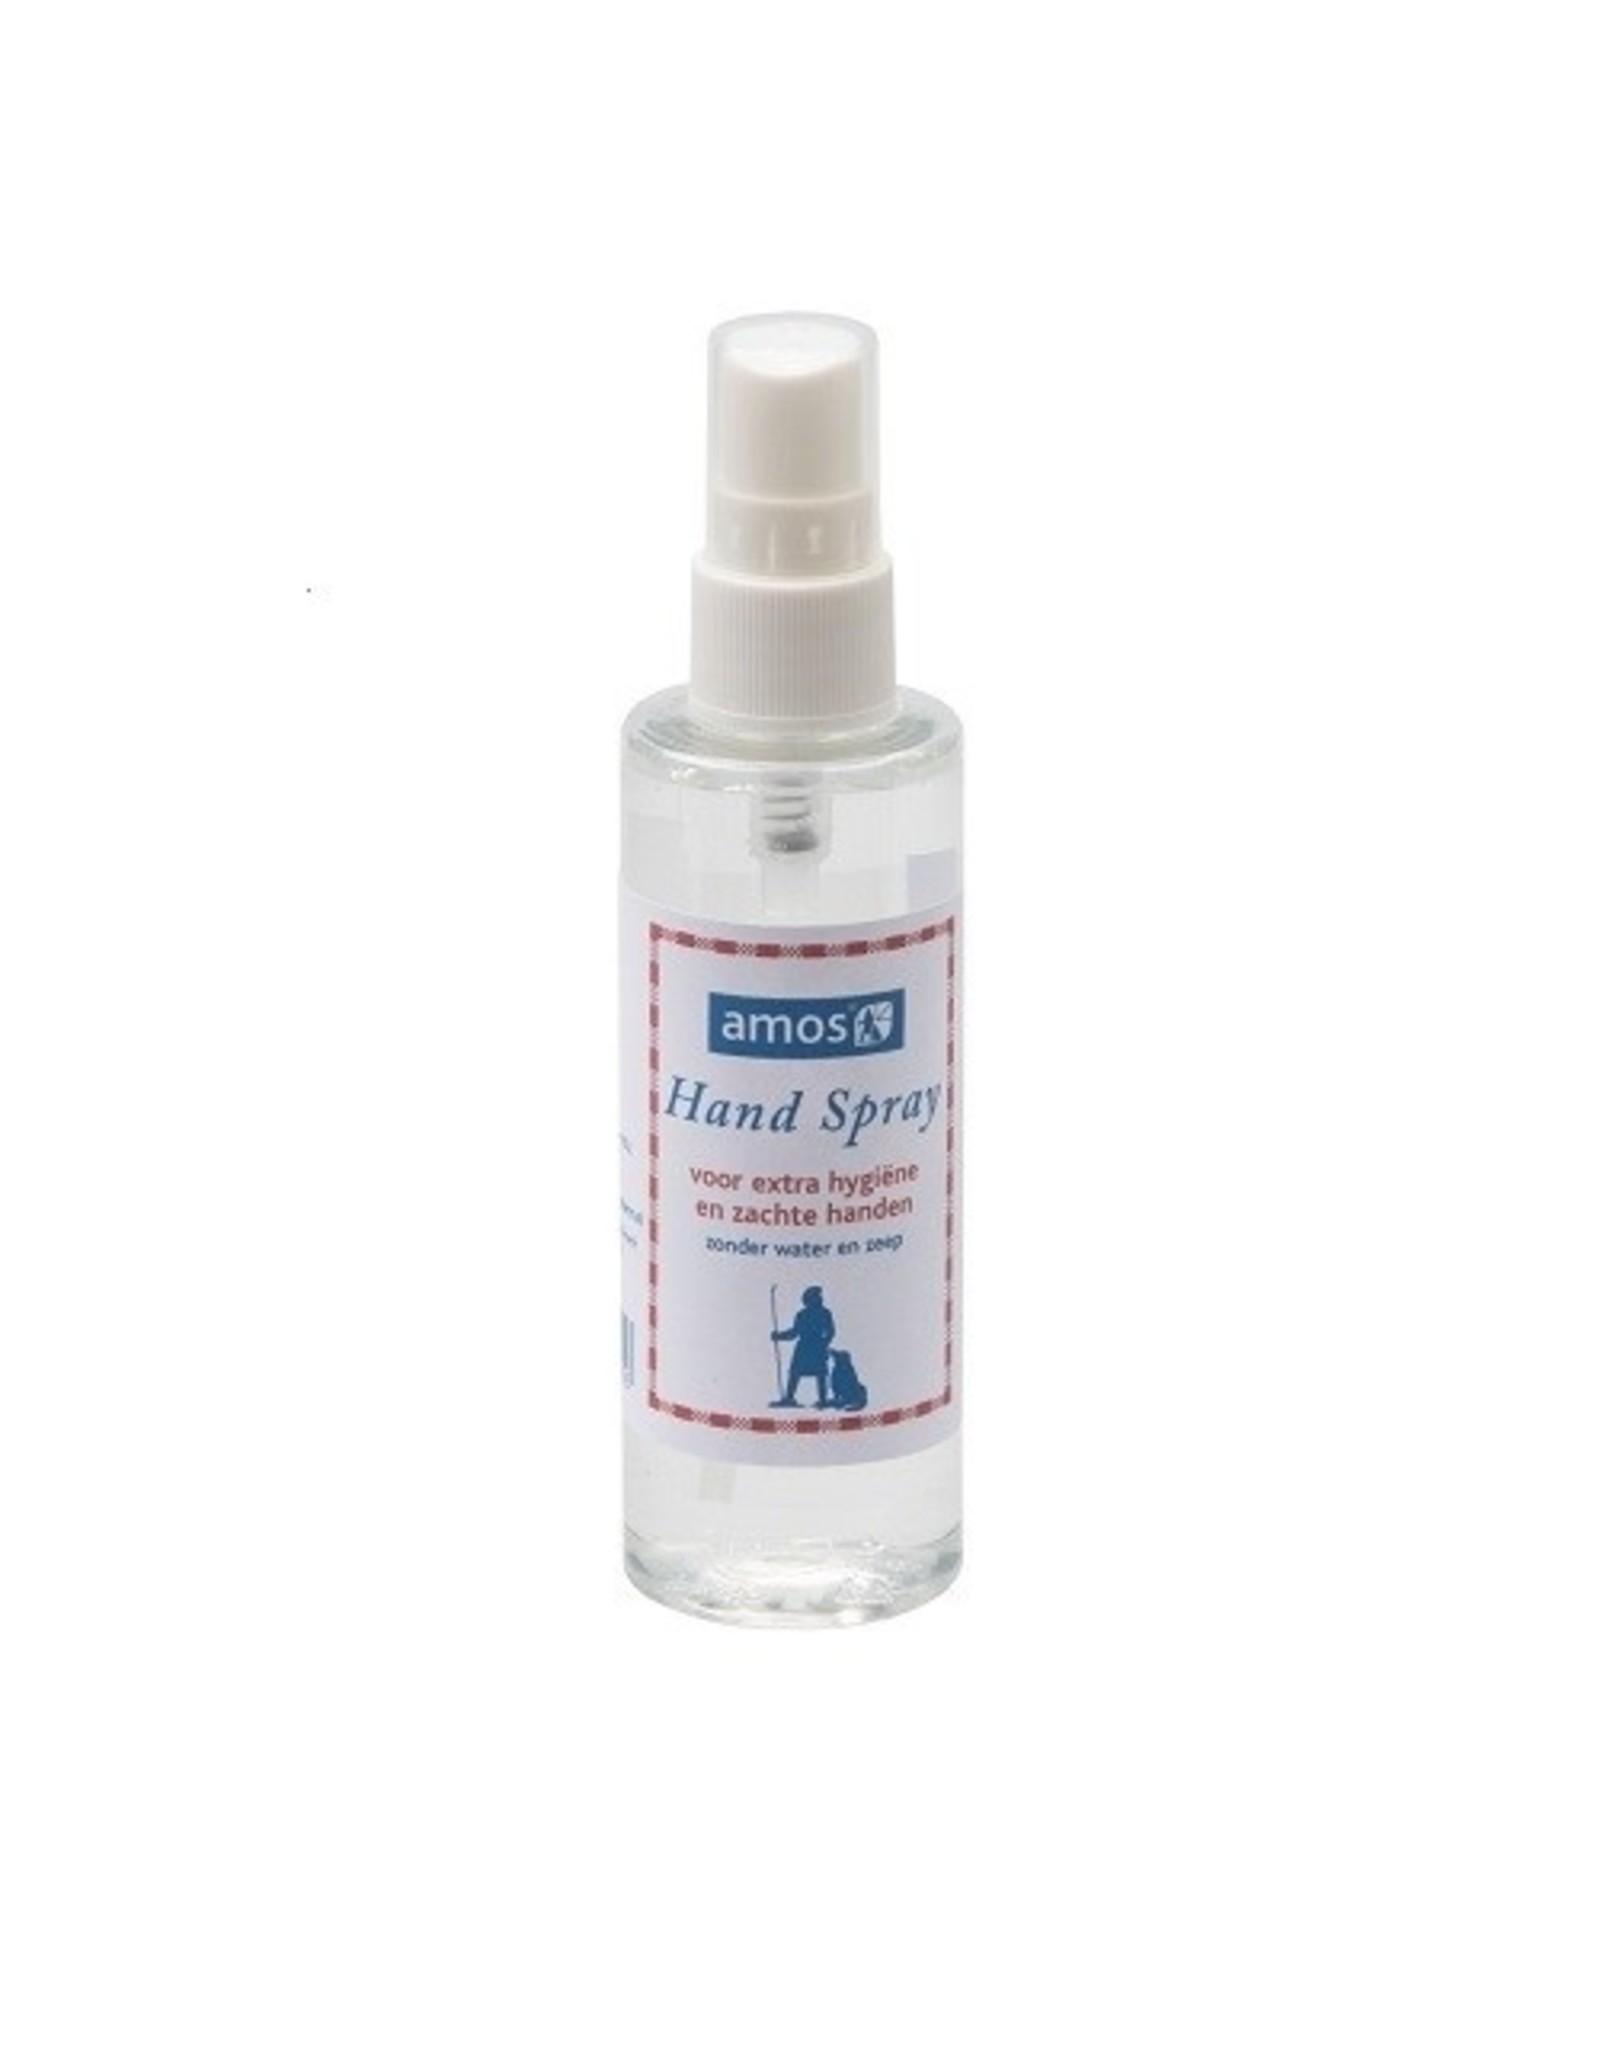 Amos handspray 100 ml voor extra hygiëne